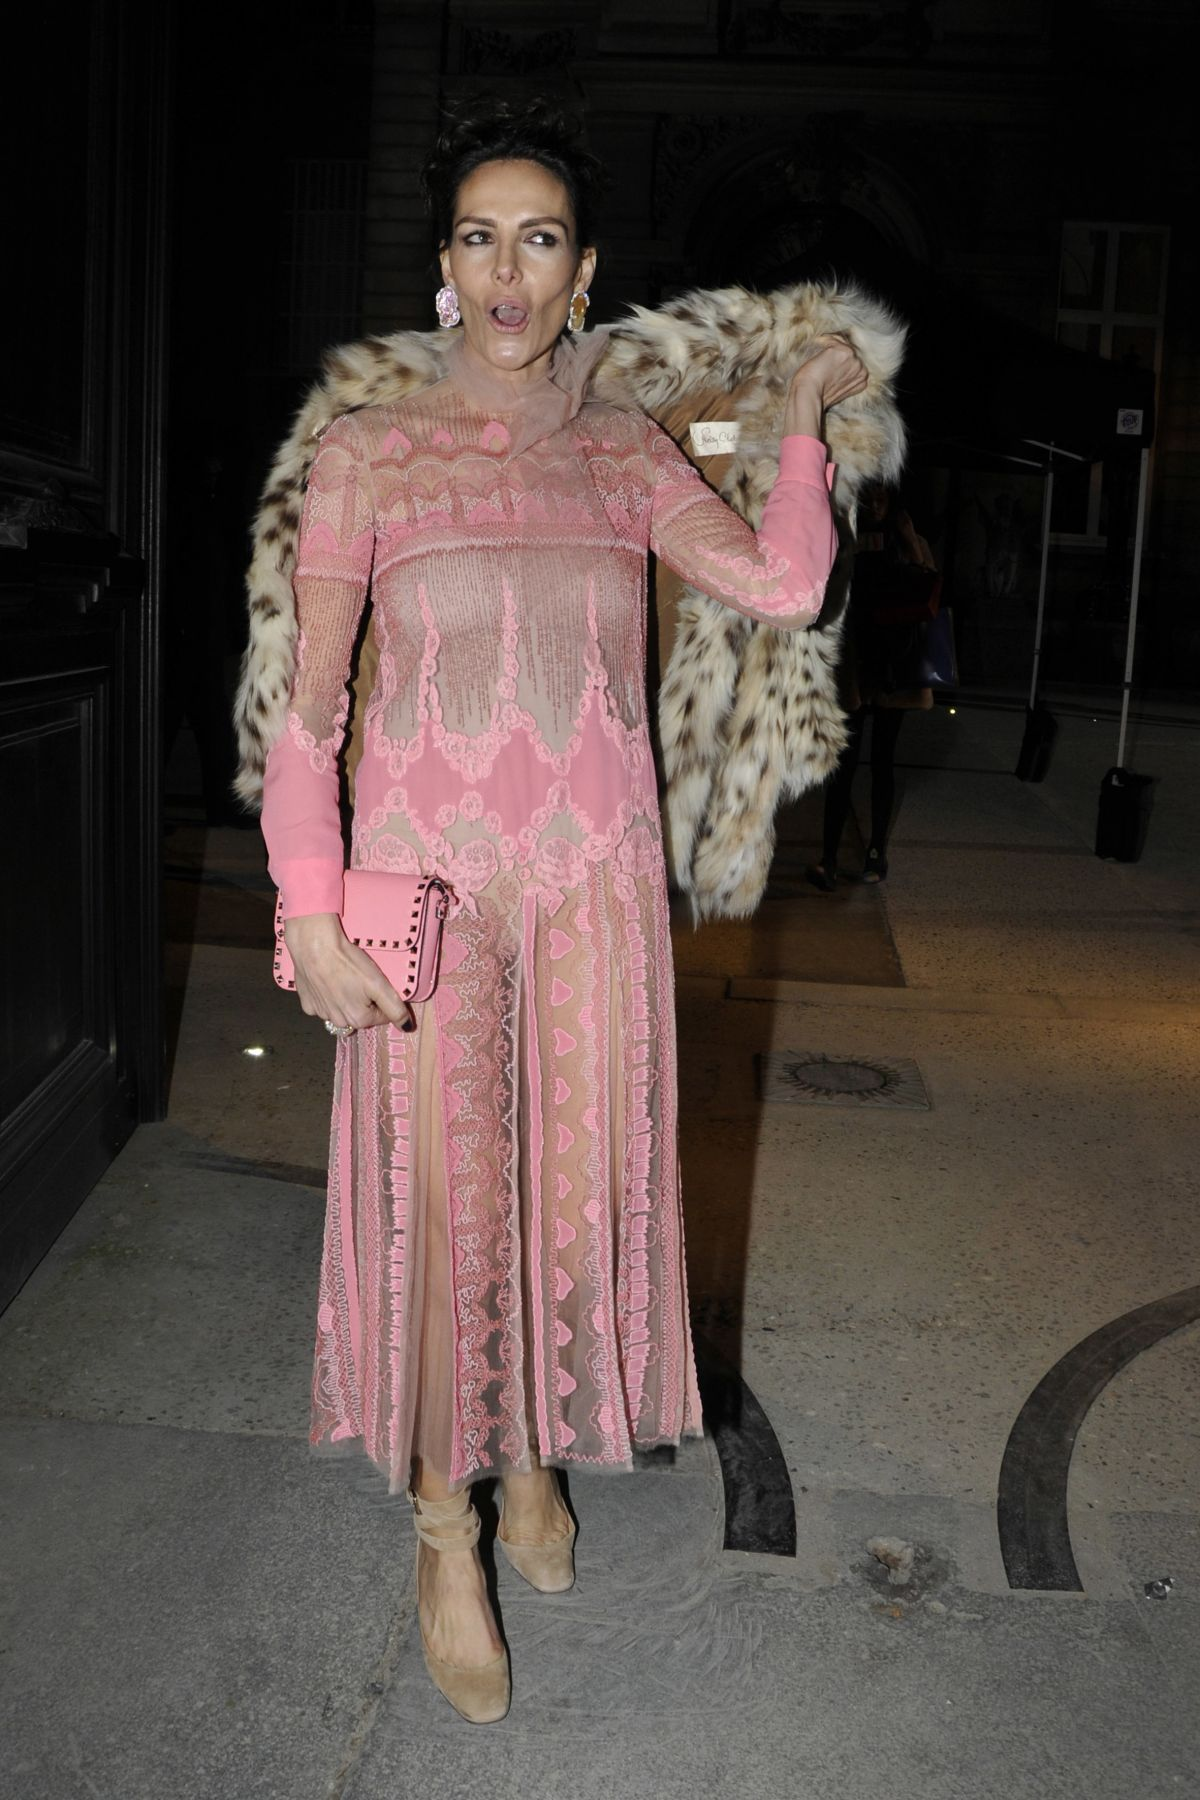 ADRIANA ABASCAL at Valentino Fashion Show at Paris Fashion Week 01/25/2017